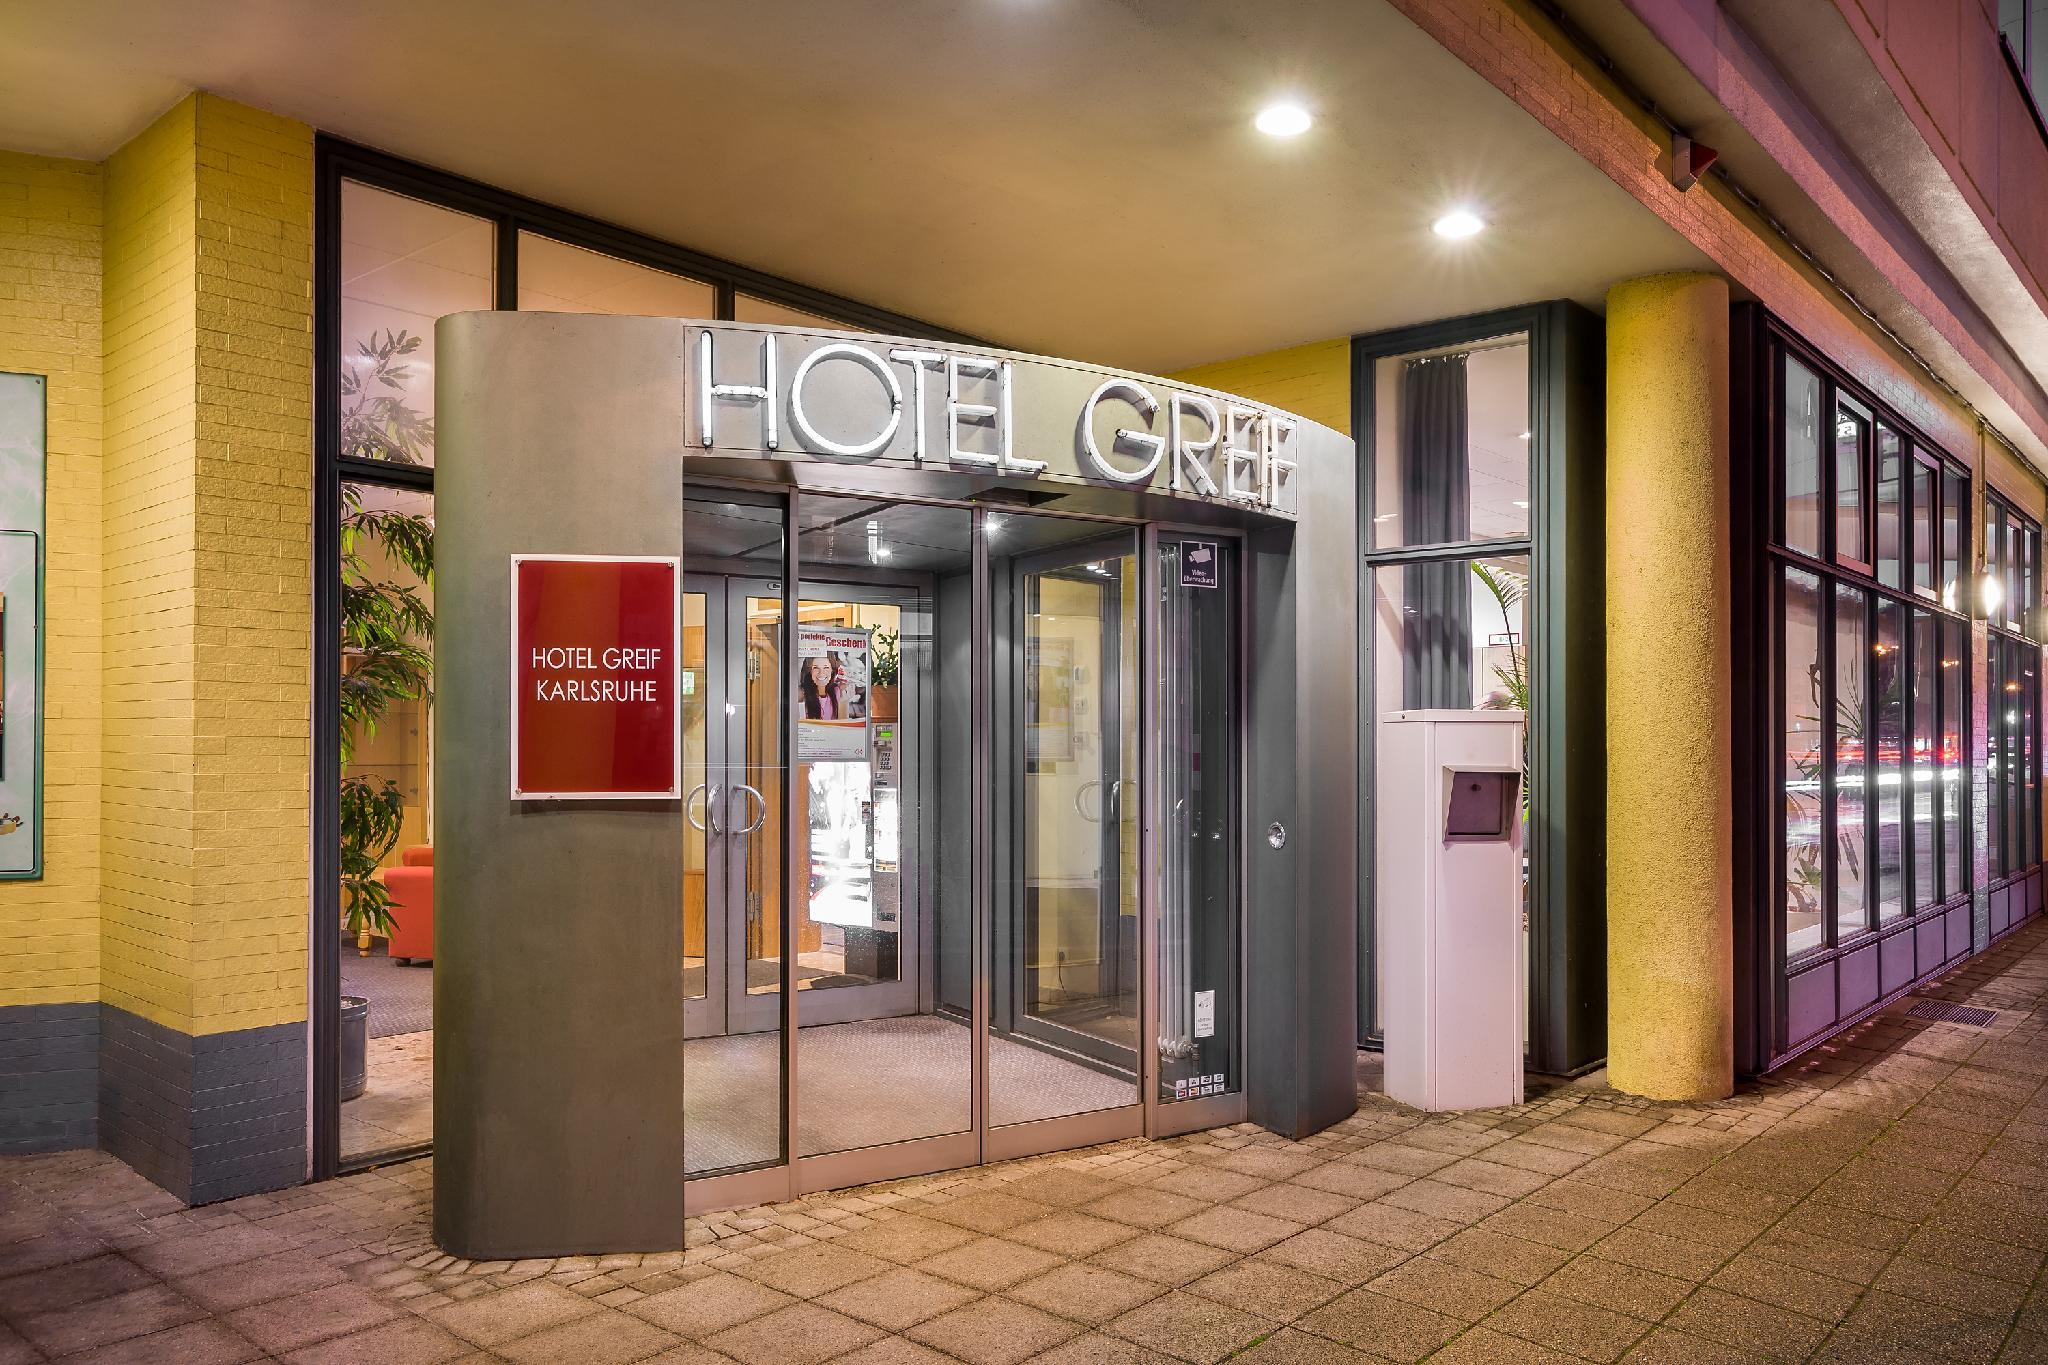 Hotel Greif, Karlsruhe